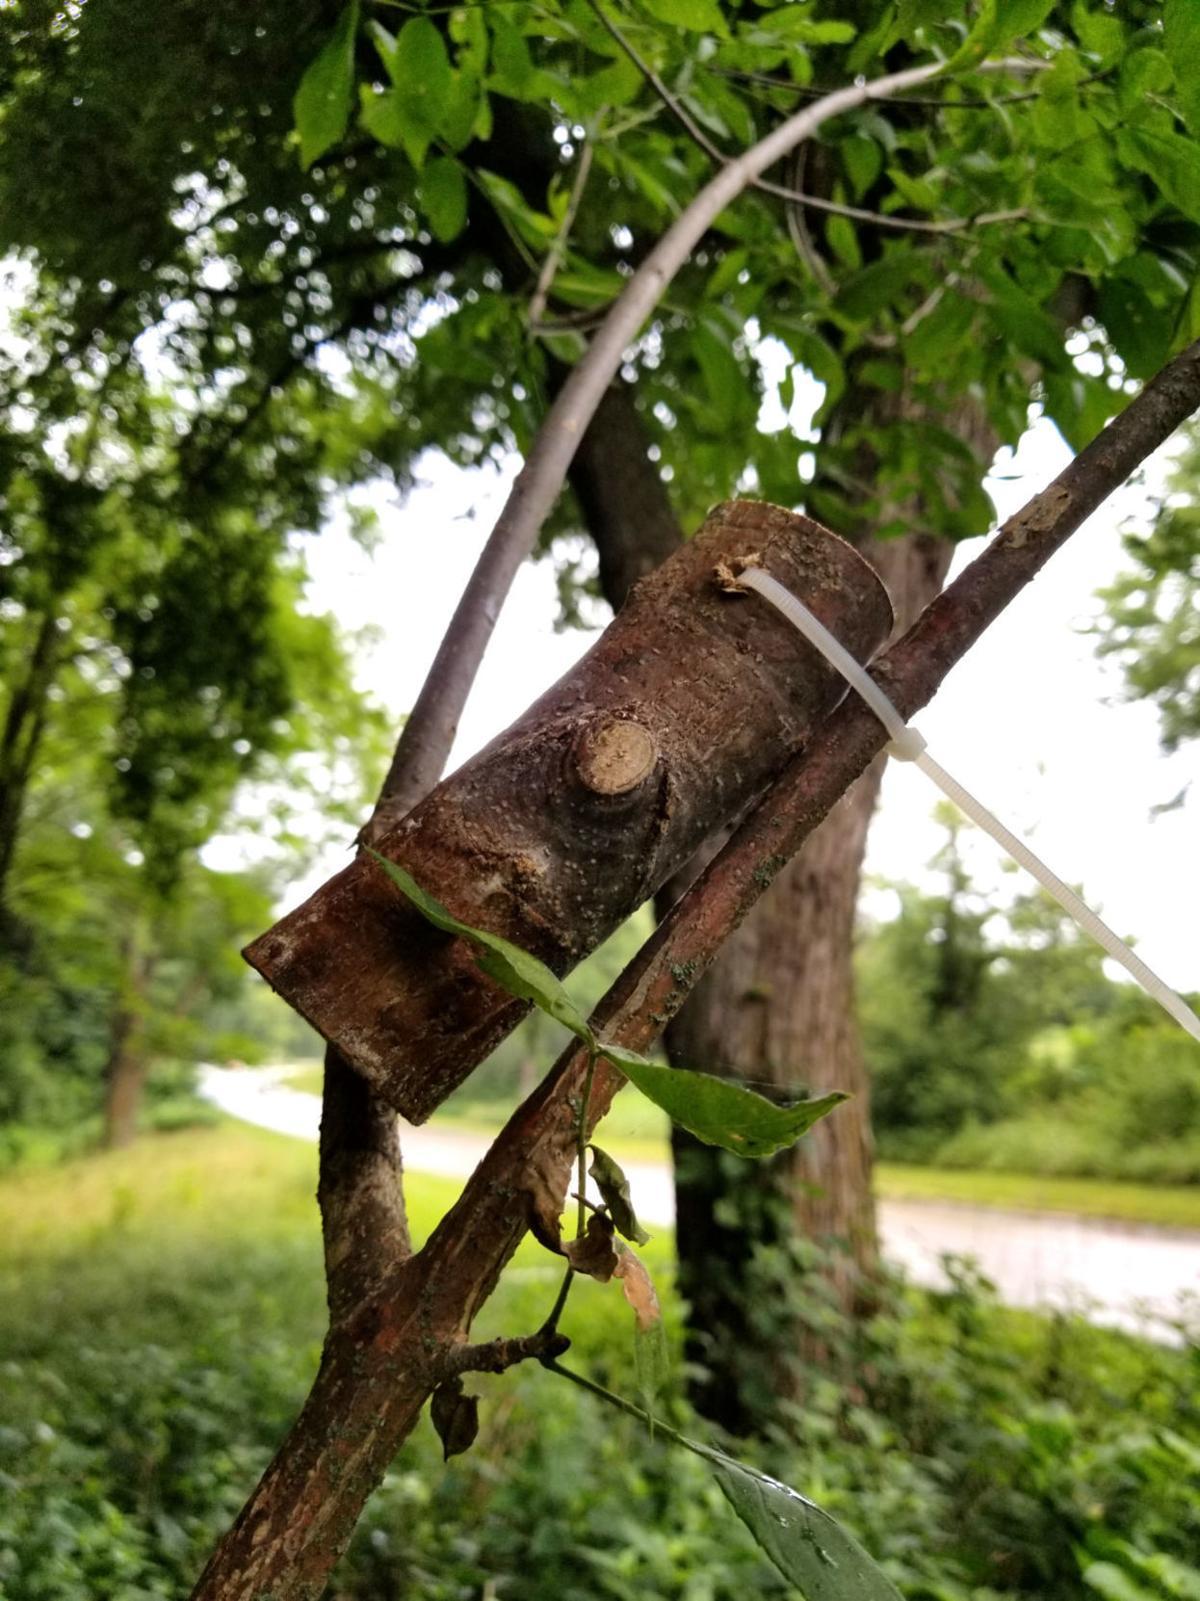 Ash borer wasps